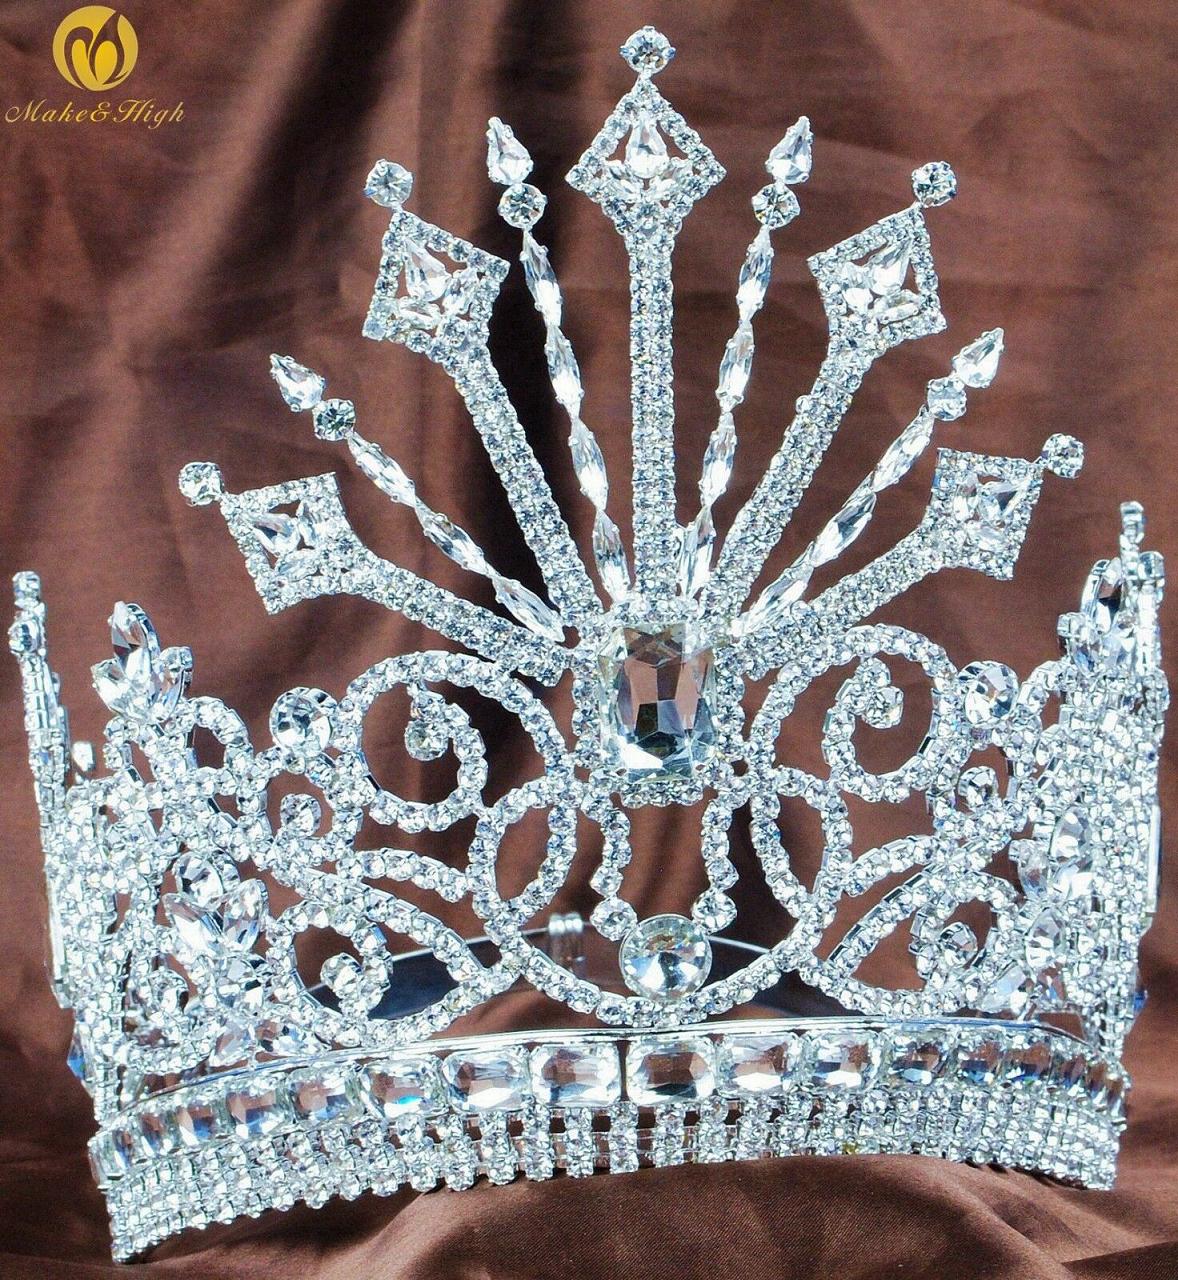 "Best Tiara Bling Online: Pageant 7"" Tiara Crown with Austrian Rhinestones and Diamonds"